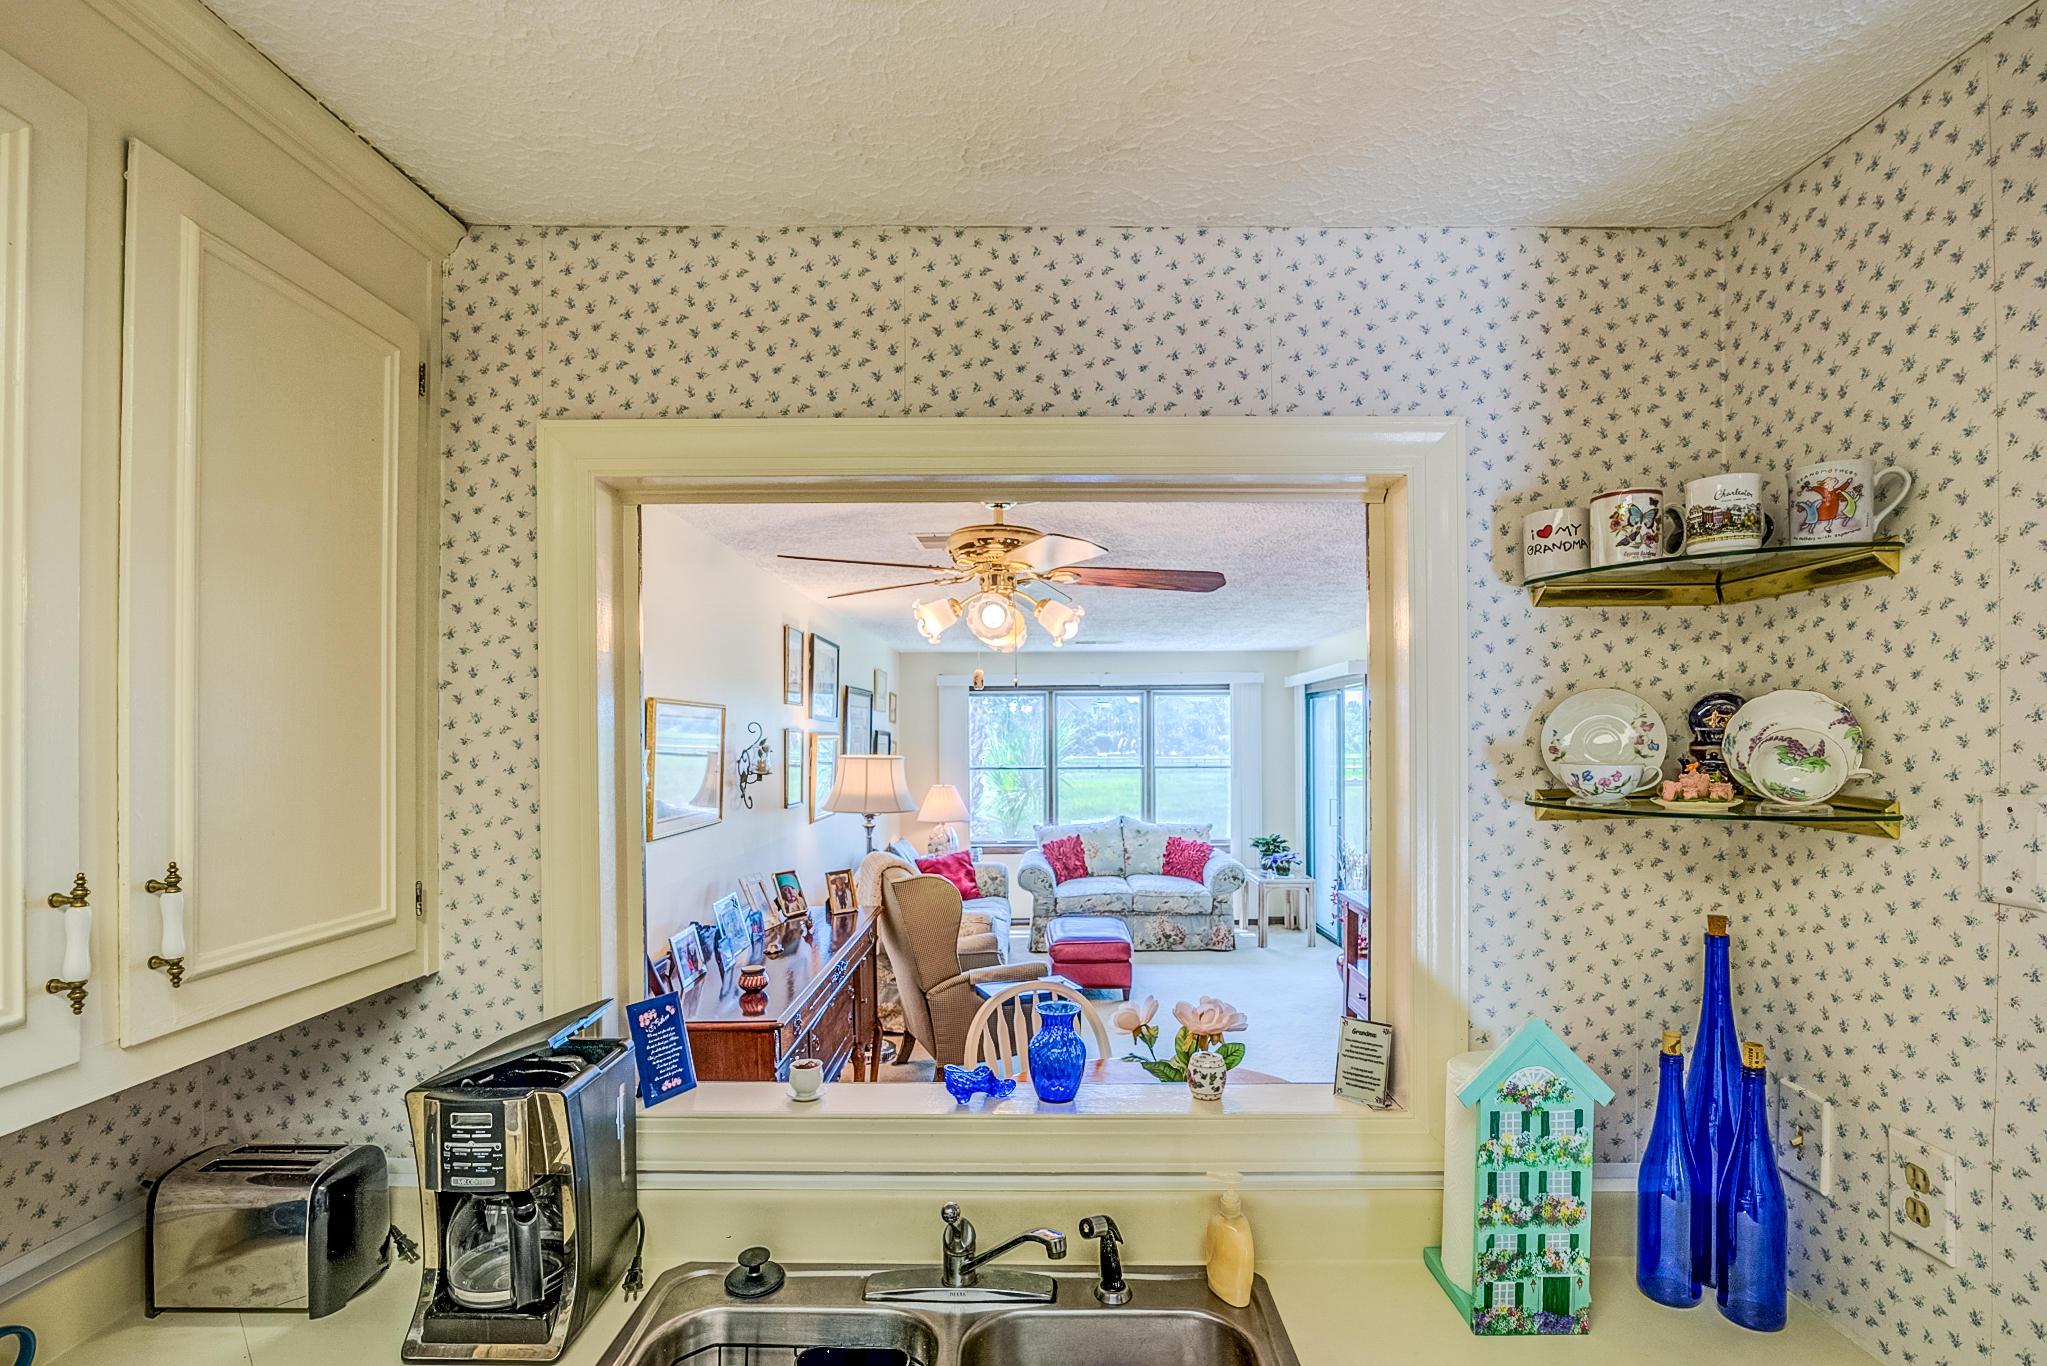 Bay Pointe Villas Homes For Sale - 2127 Landfall, Johns Island, SC - 3